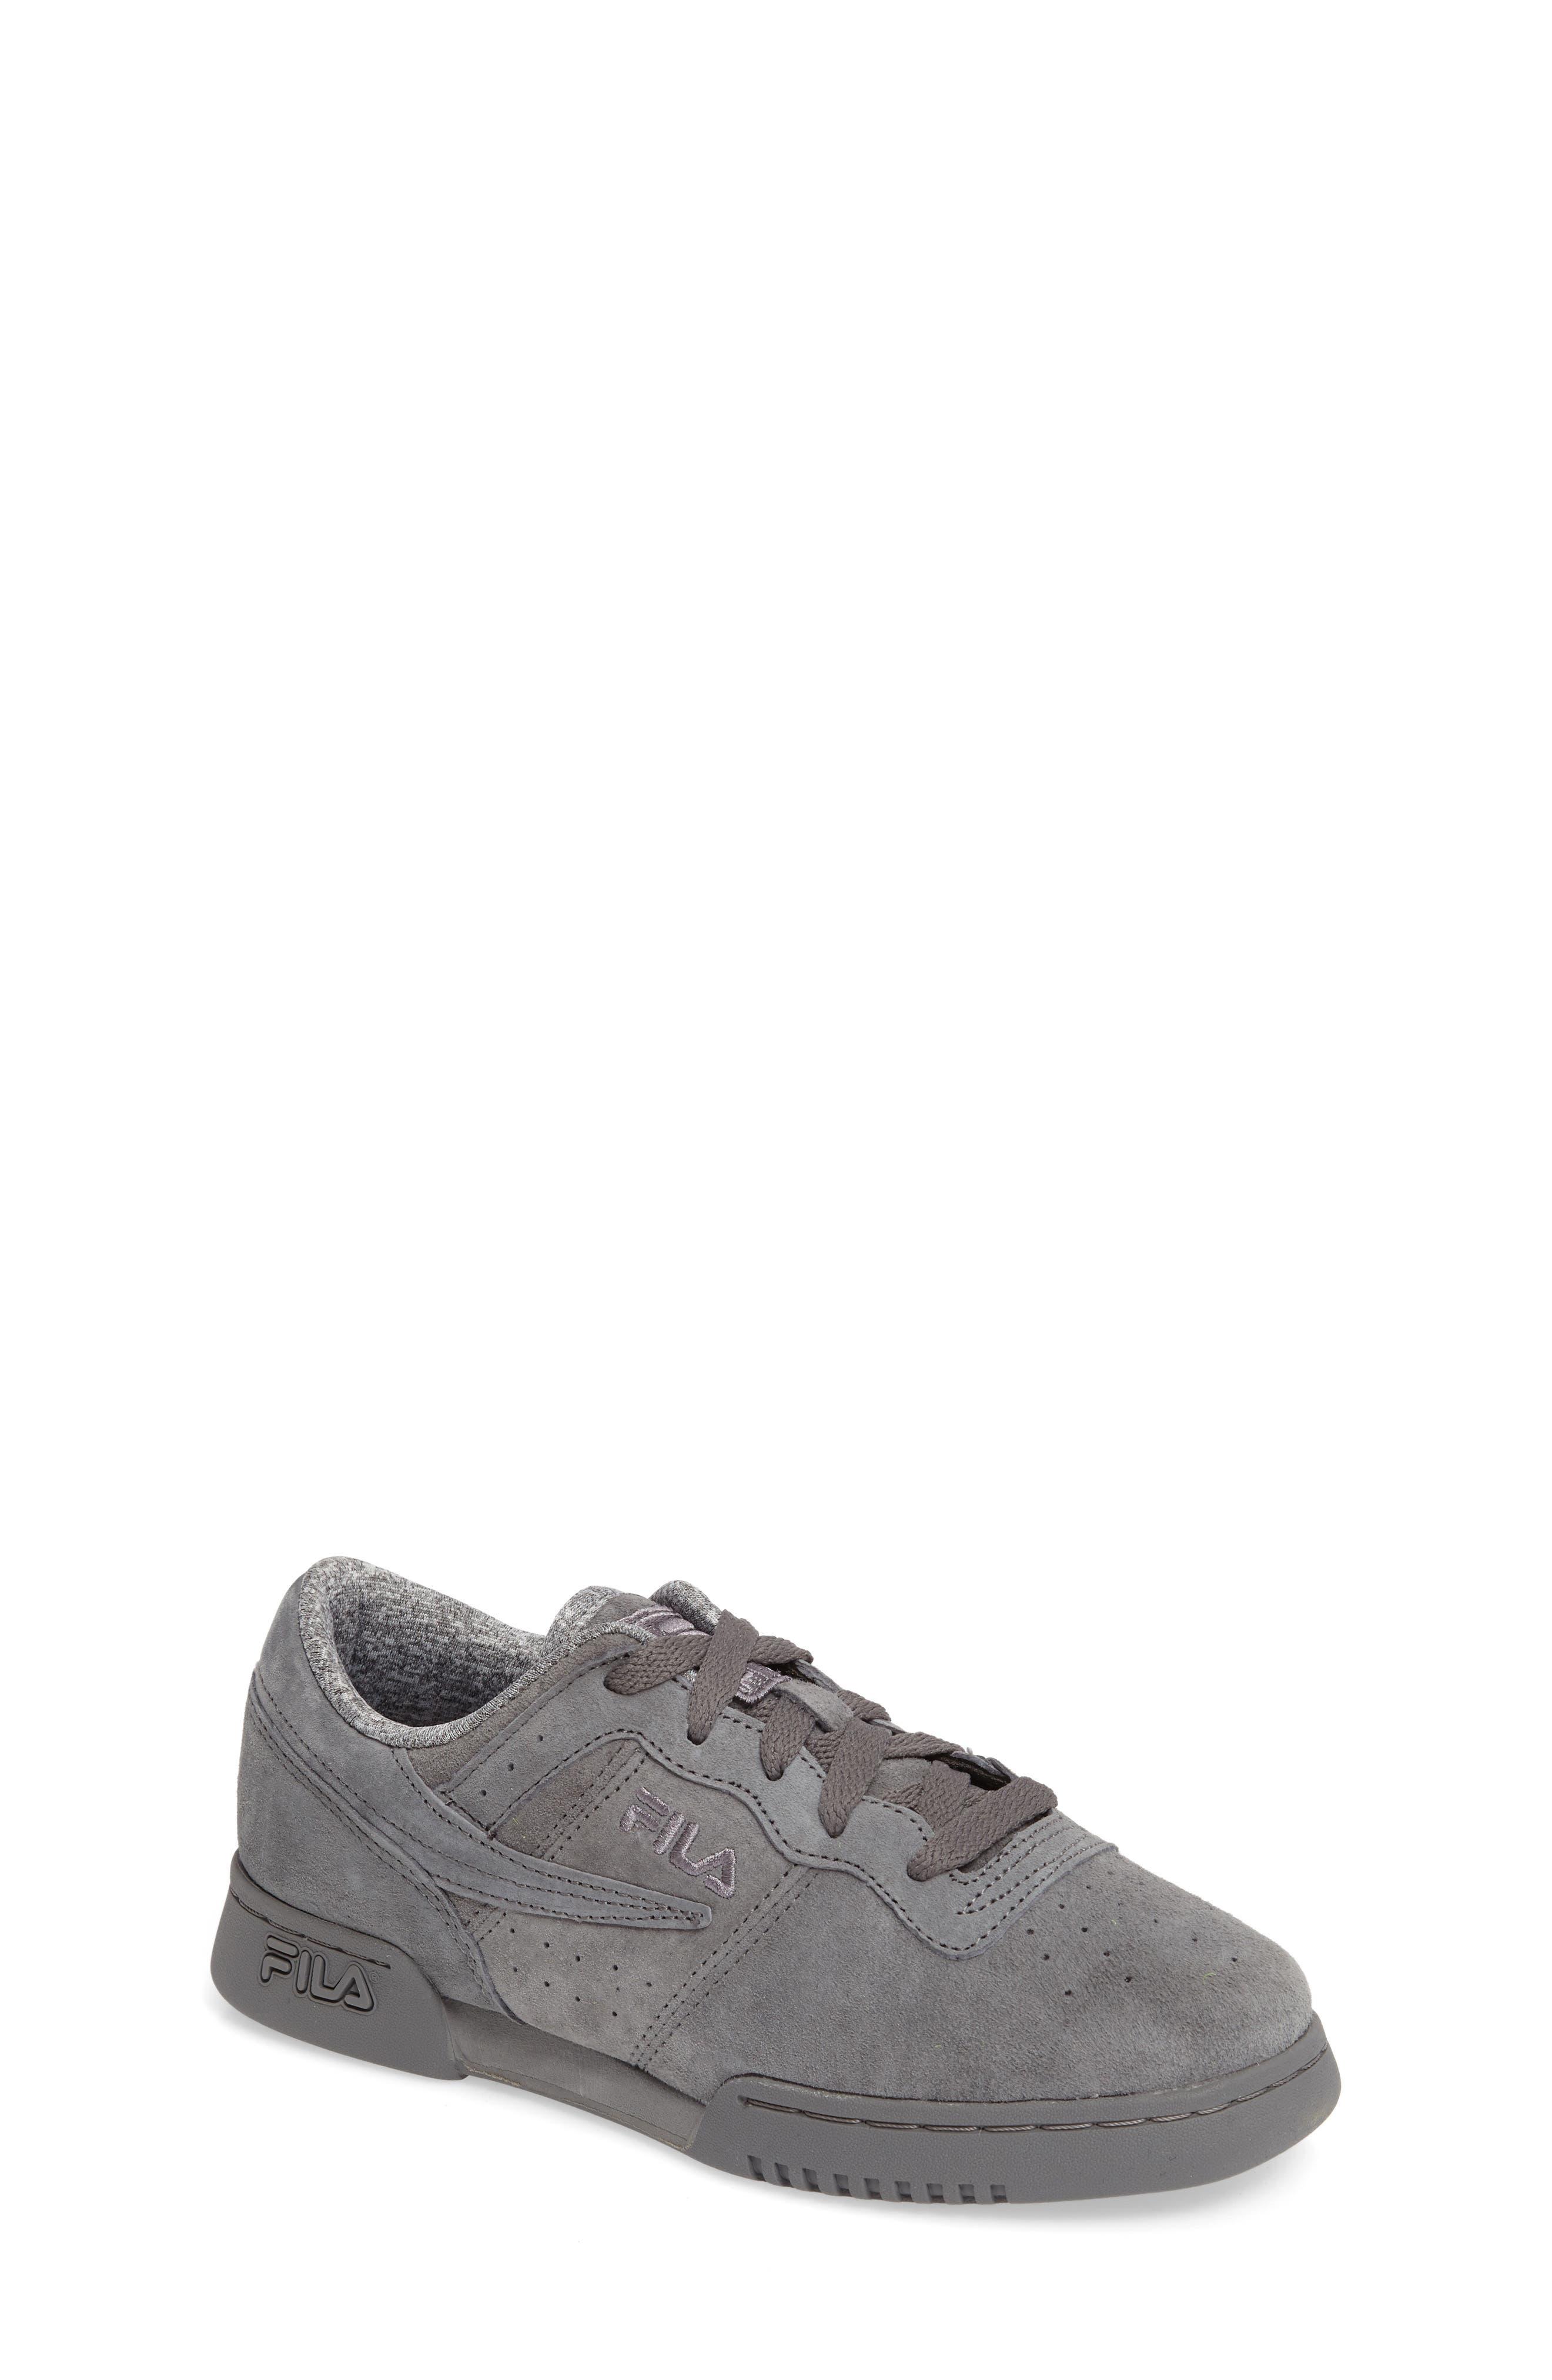 Heritage Sneaker,                             Main thumbnail 1, color,                             050